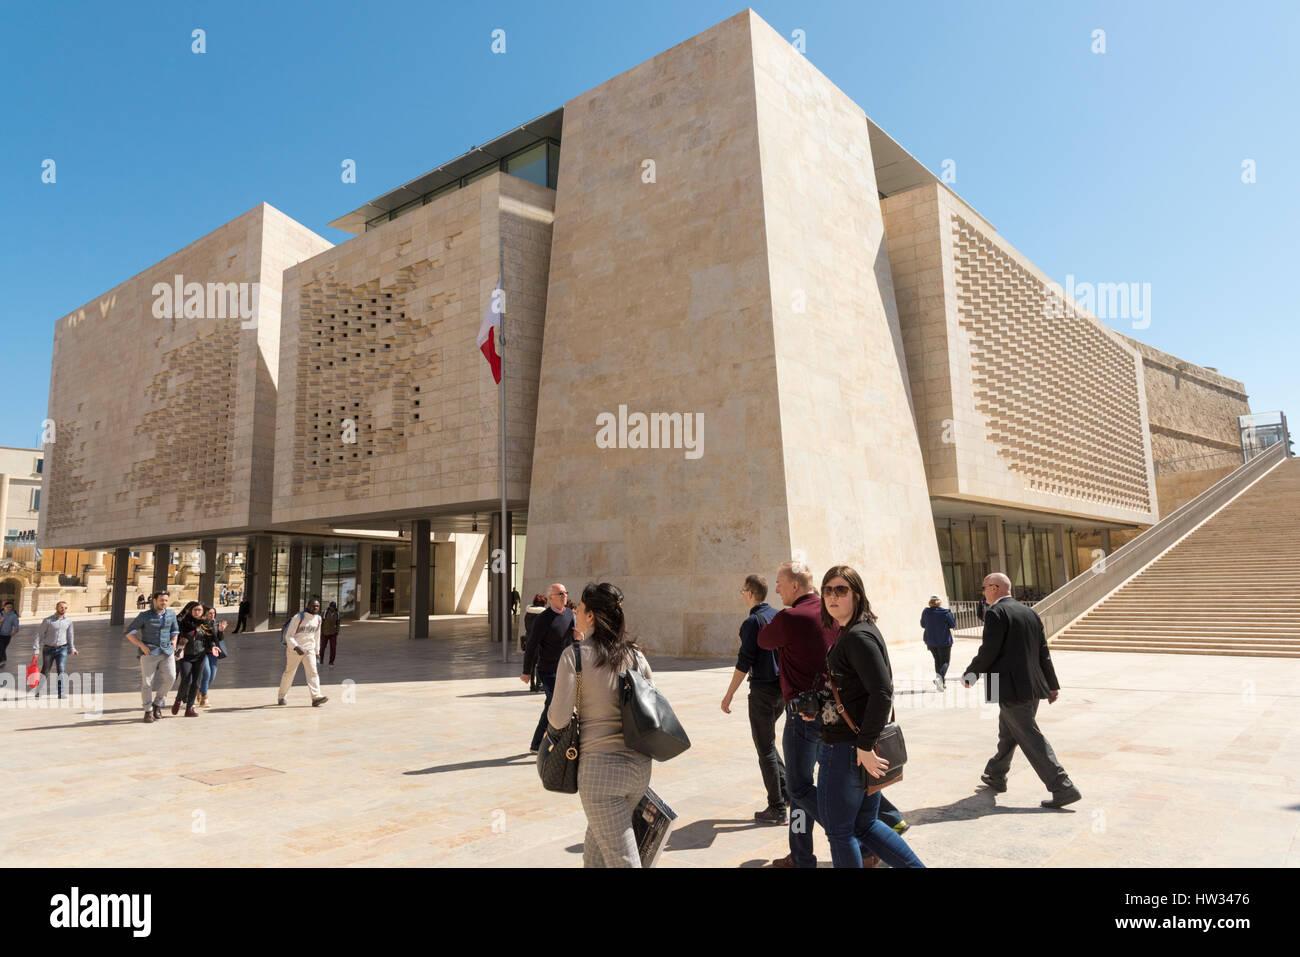 The Renzo Piano designed Parliament Building in Valetta Malta. Valetta will be the European City of culture in 2018 - Stock Image